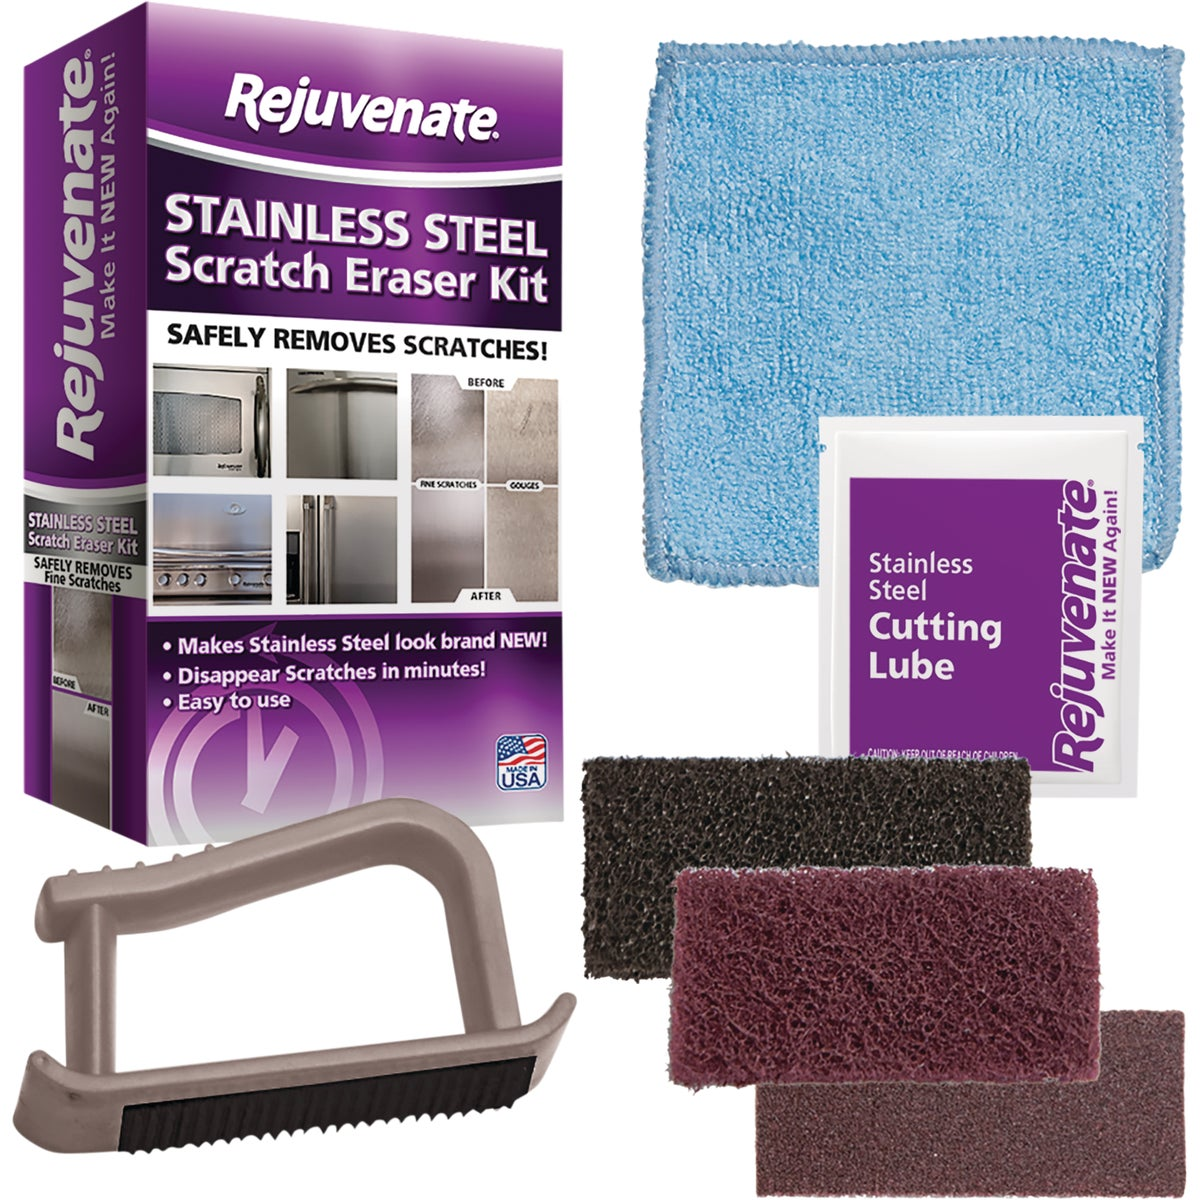 Stainless Steel Scratch Eraser Appliance Cleaner Kit